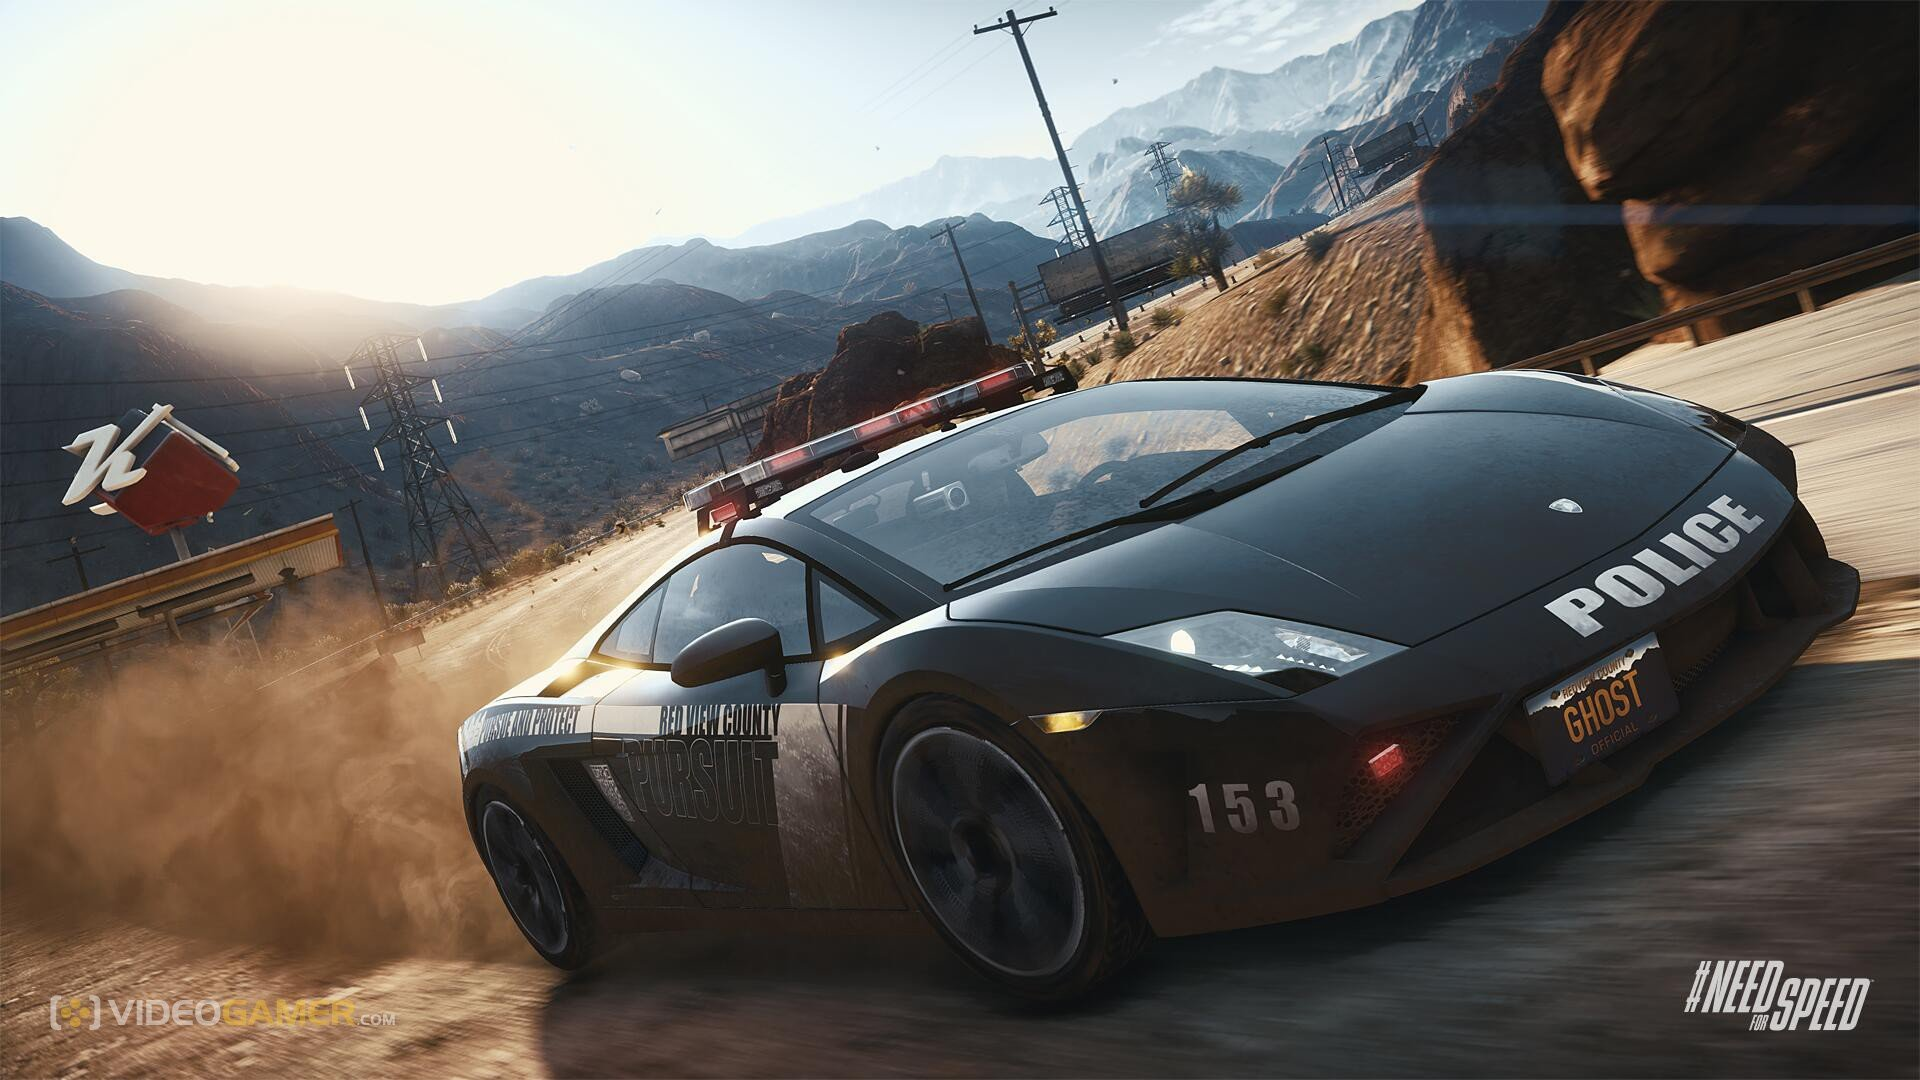 Lamborghini-Gallardo - Need-for-Speed -Rivals wallpaper backgroundNfs Rivals Lamborghini